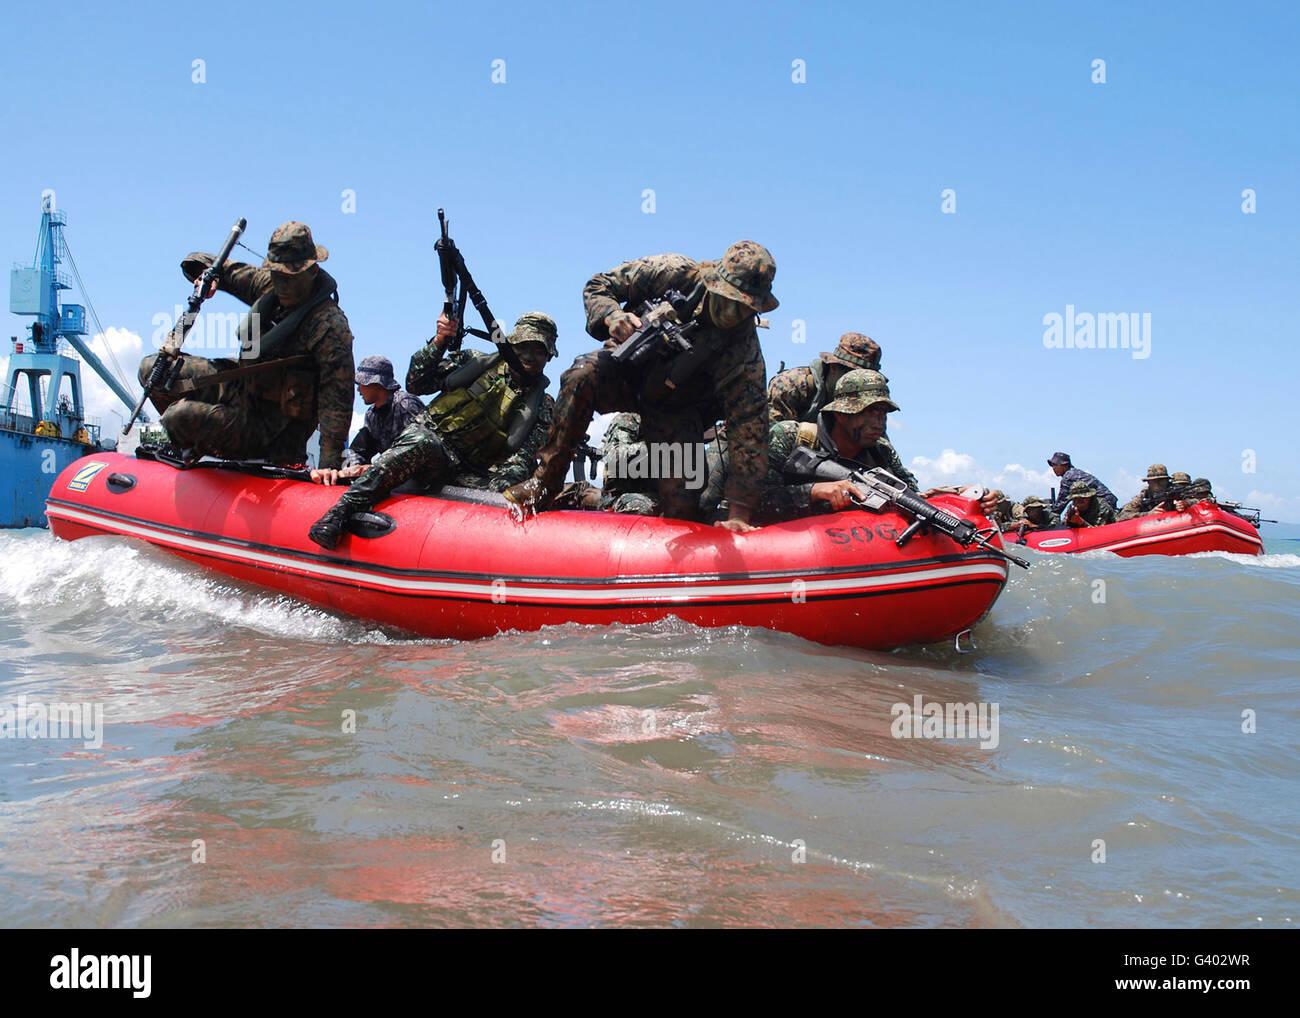 U.S. Marines and Philippine Marines ride in Philippine coast Guard zodiac boat. - Stock Image